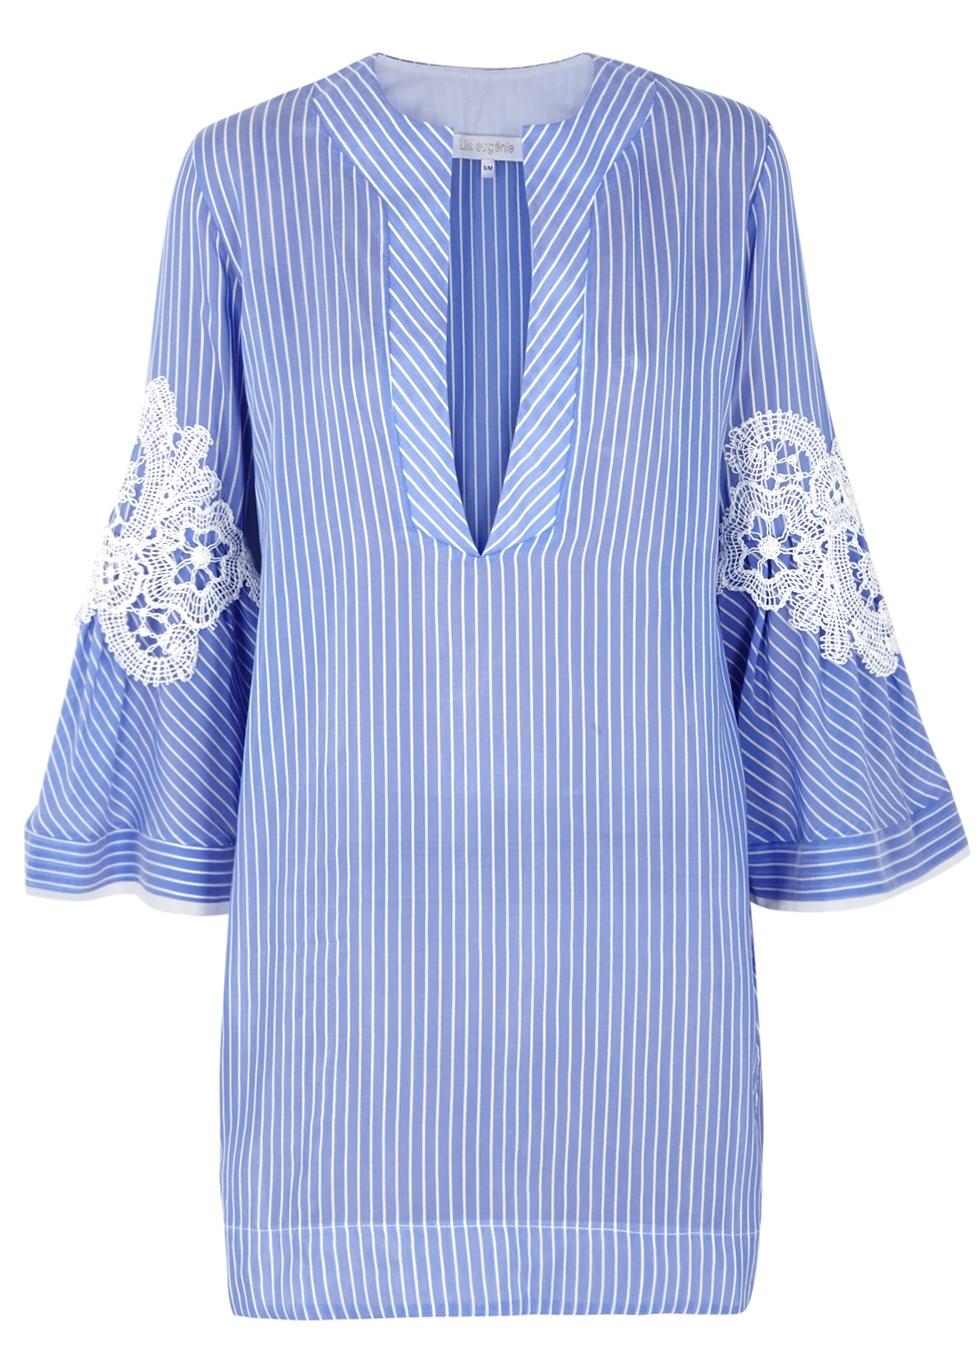 LILA.EUGENIE Lila. Eugénie Striped Appliquéd Voile Kaftan in Blue And White